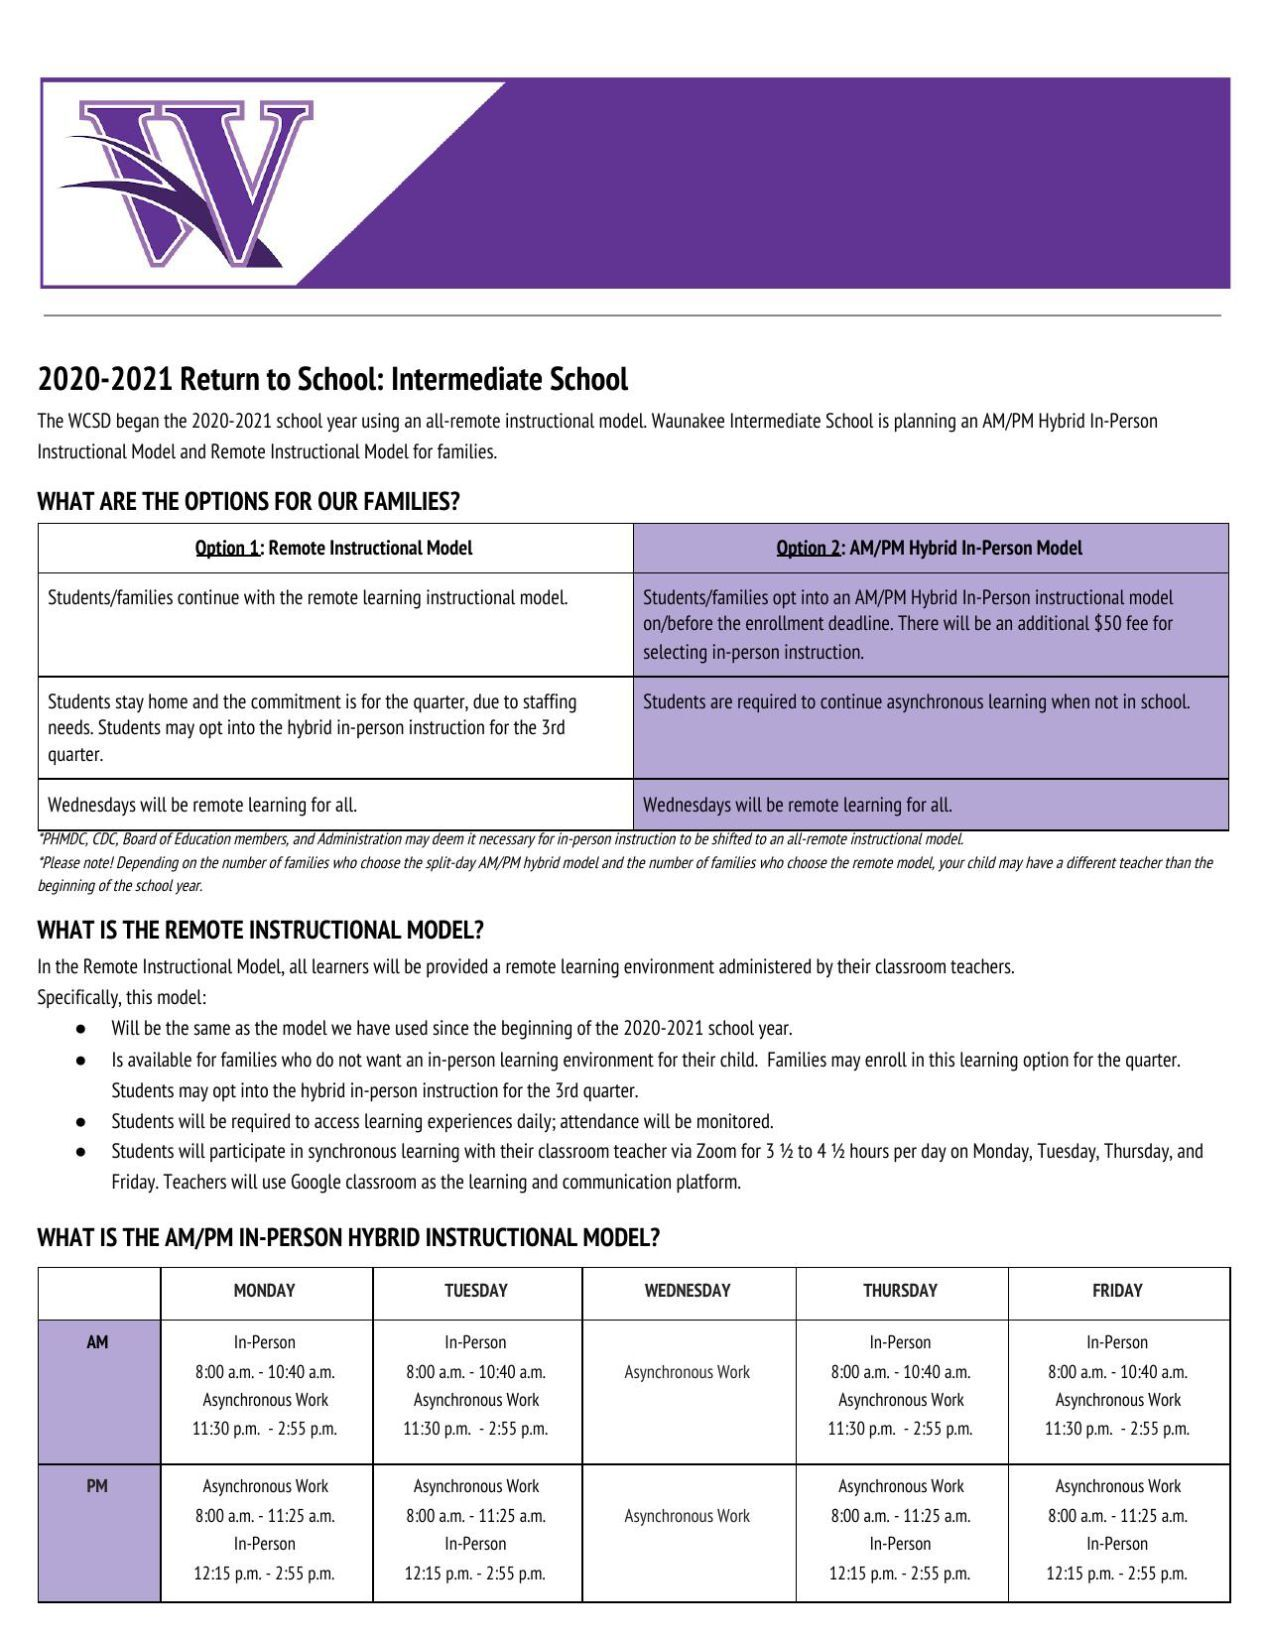 Intermediate school delivery models